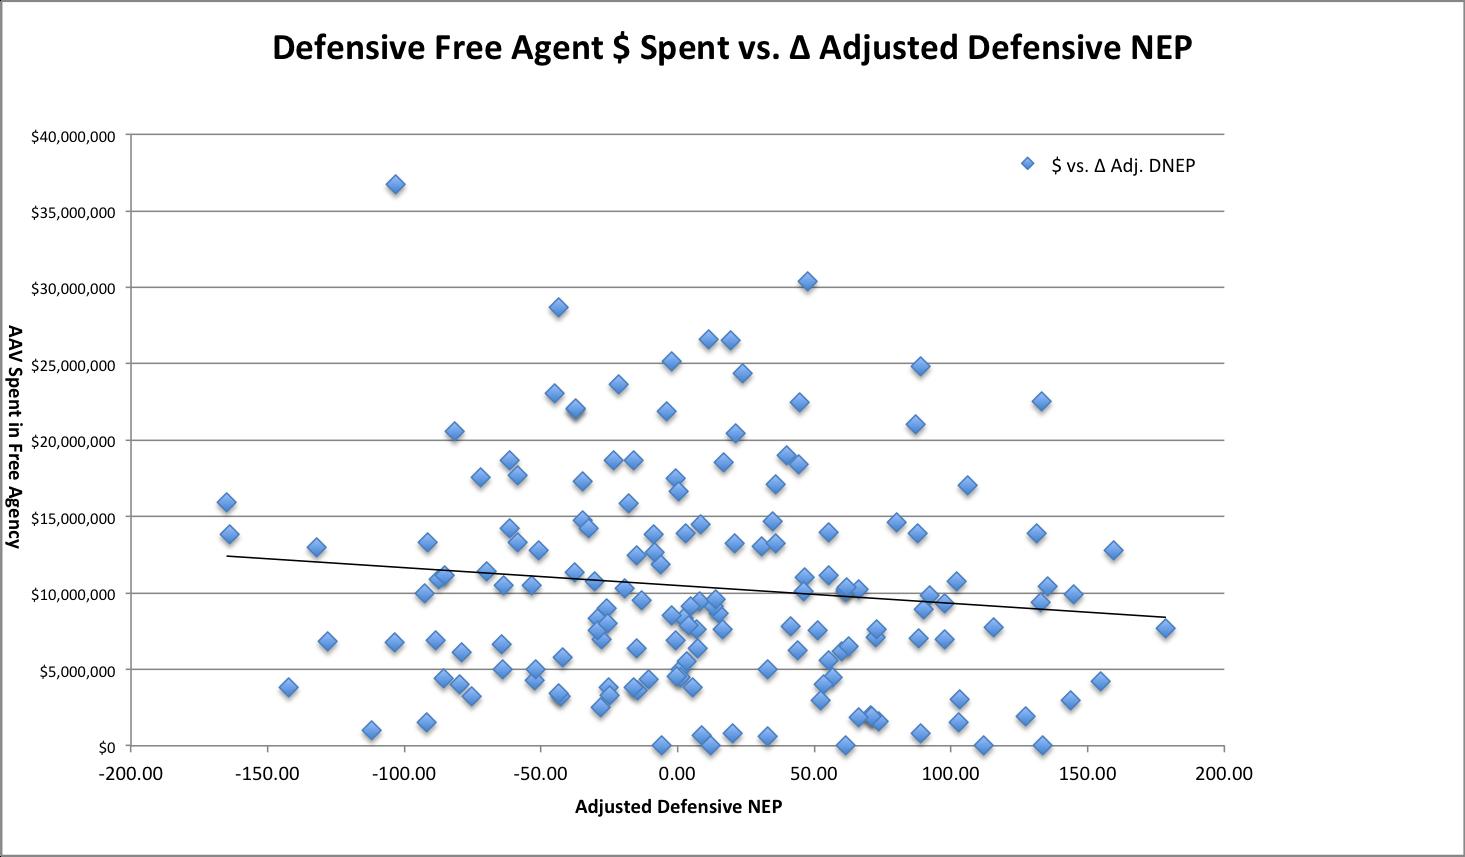 Offseason Money Spent vs. Adjusted Defensive NEP Change